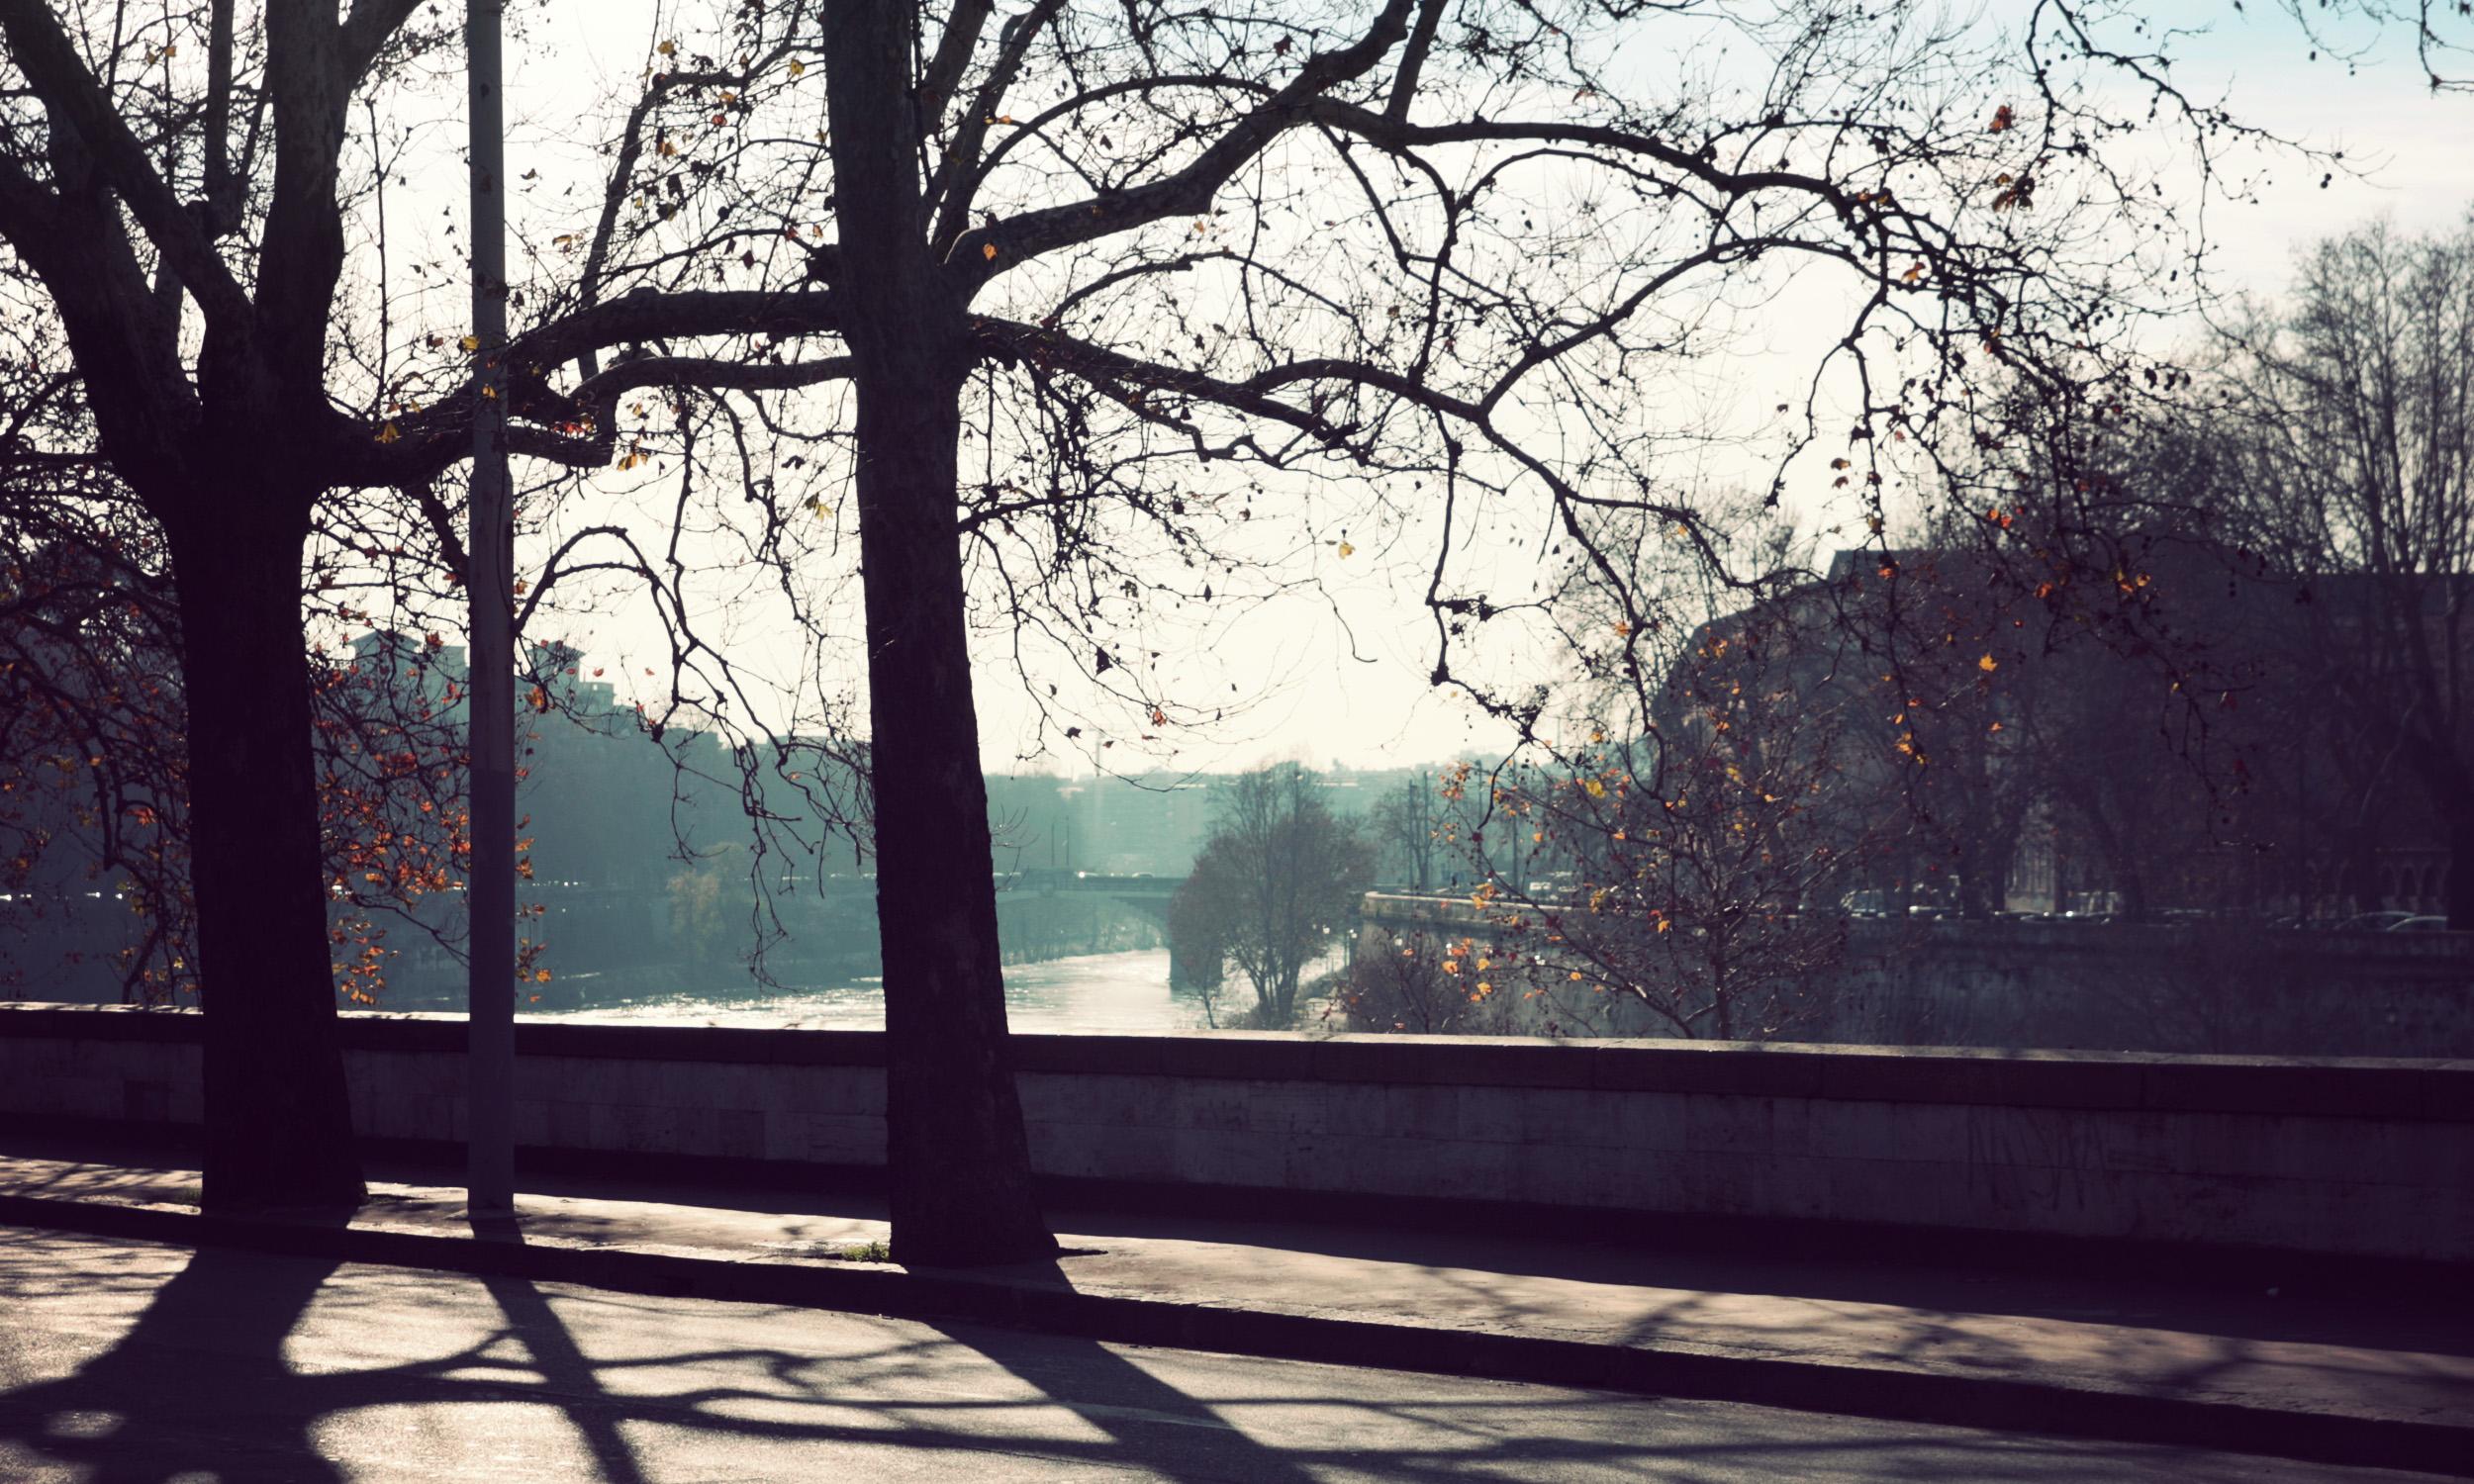 Tiber_02.jpg